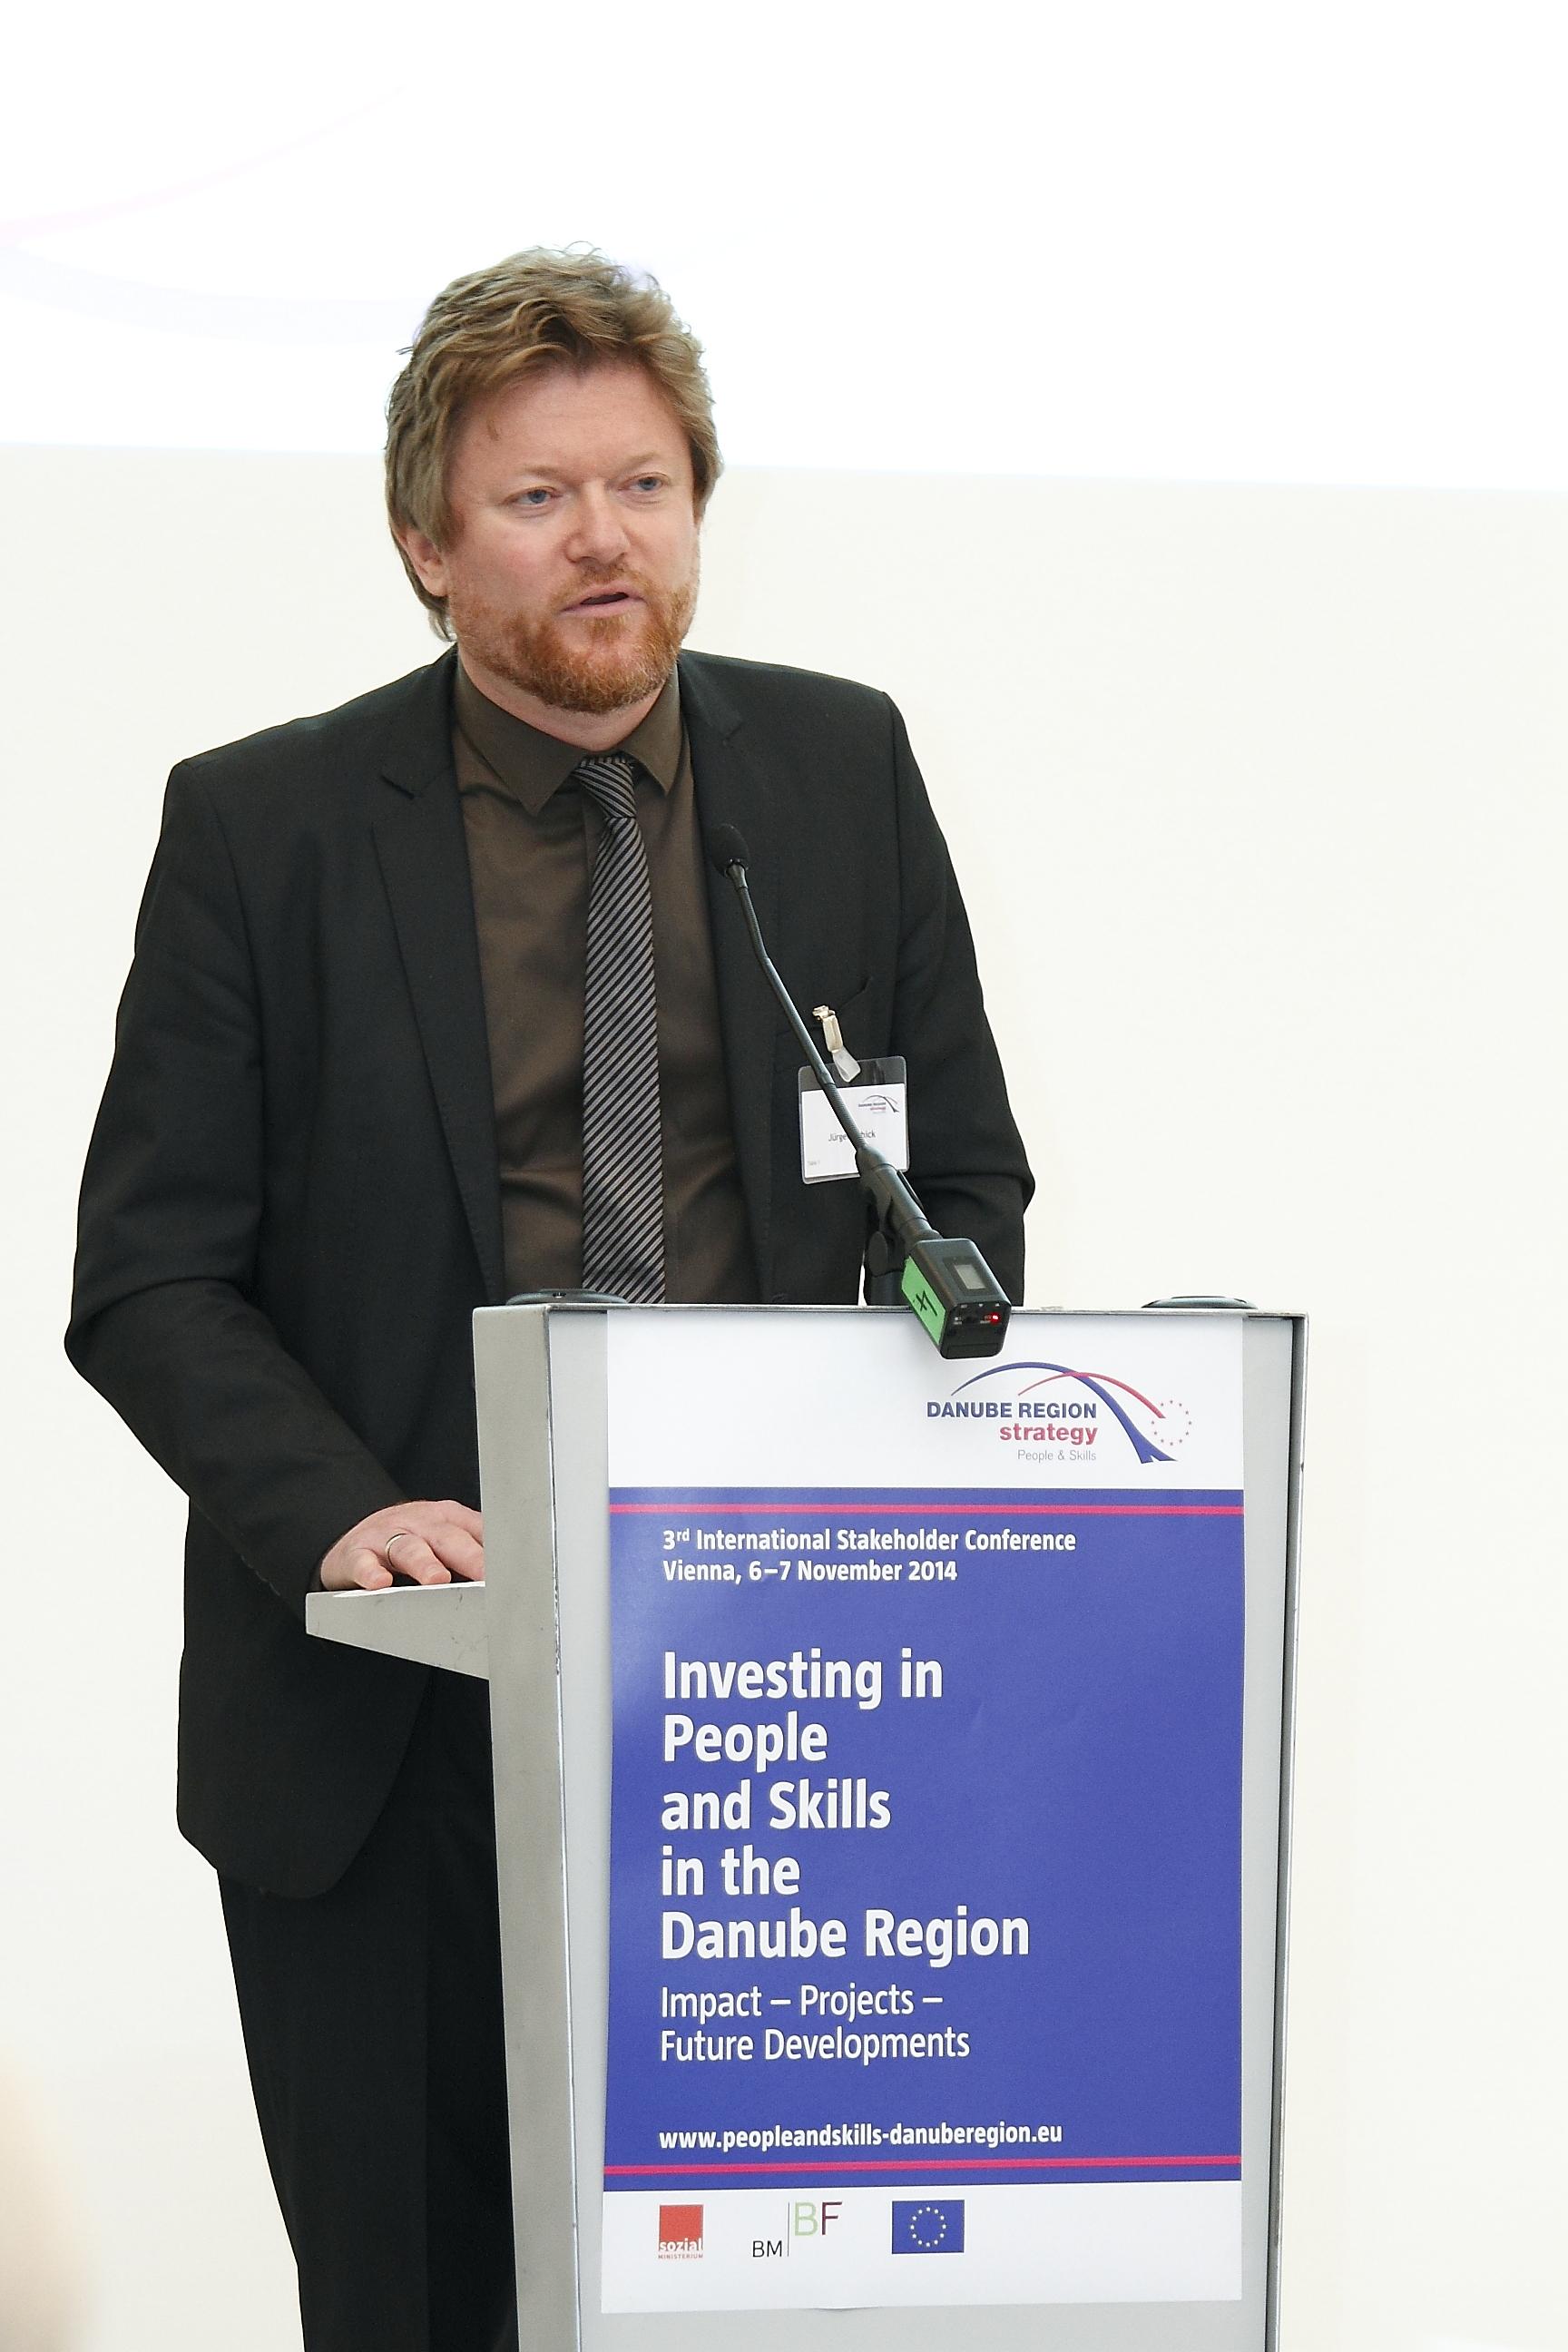 3rd Stakeholder Conference, November 2014